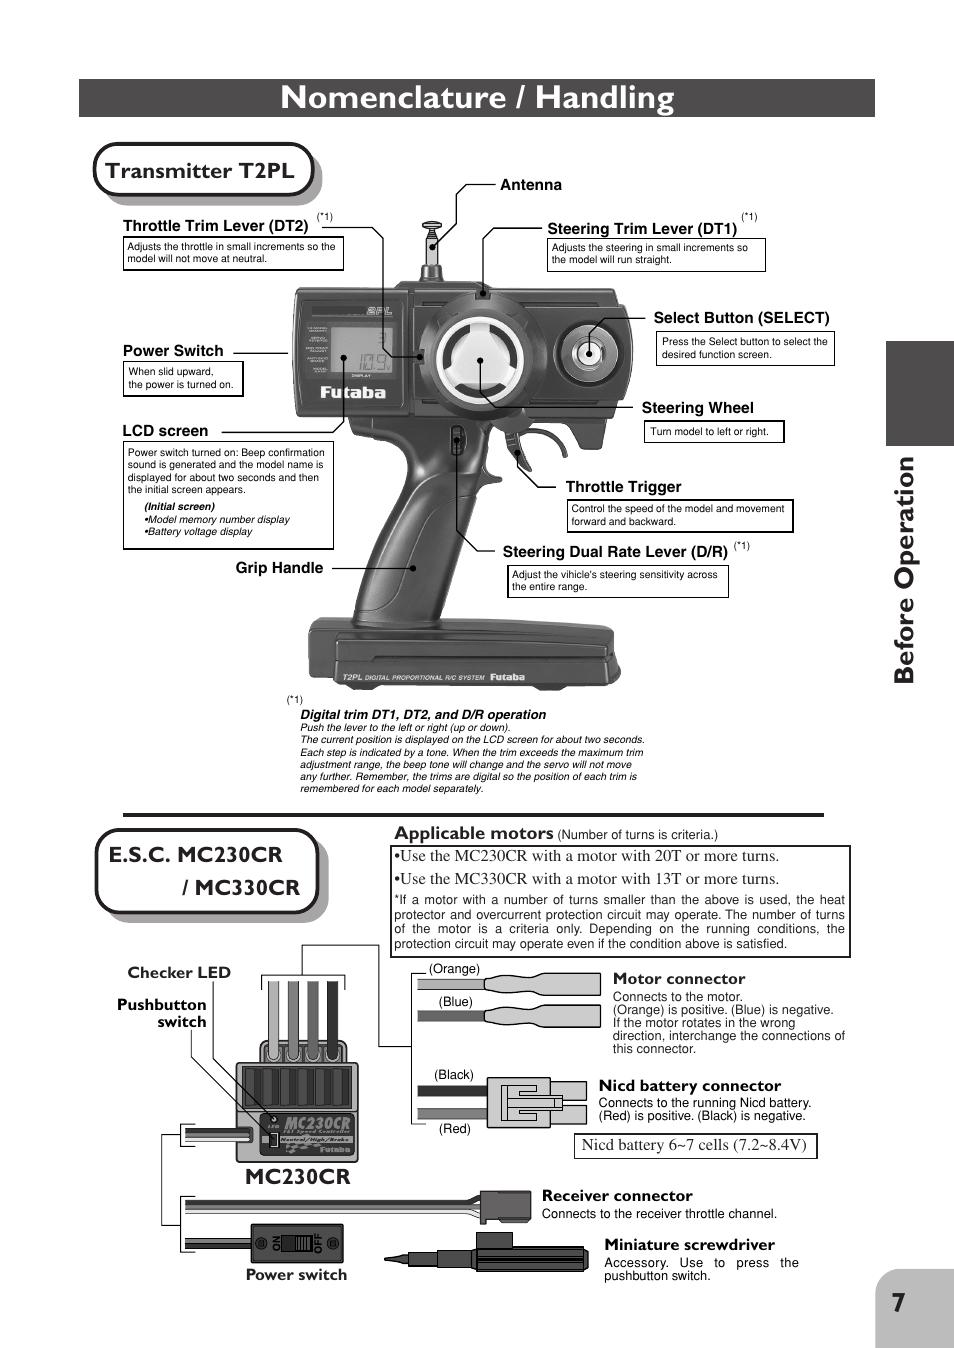 Nomenclature / handling, 7before operation, Transmitter